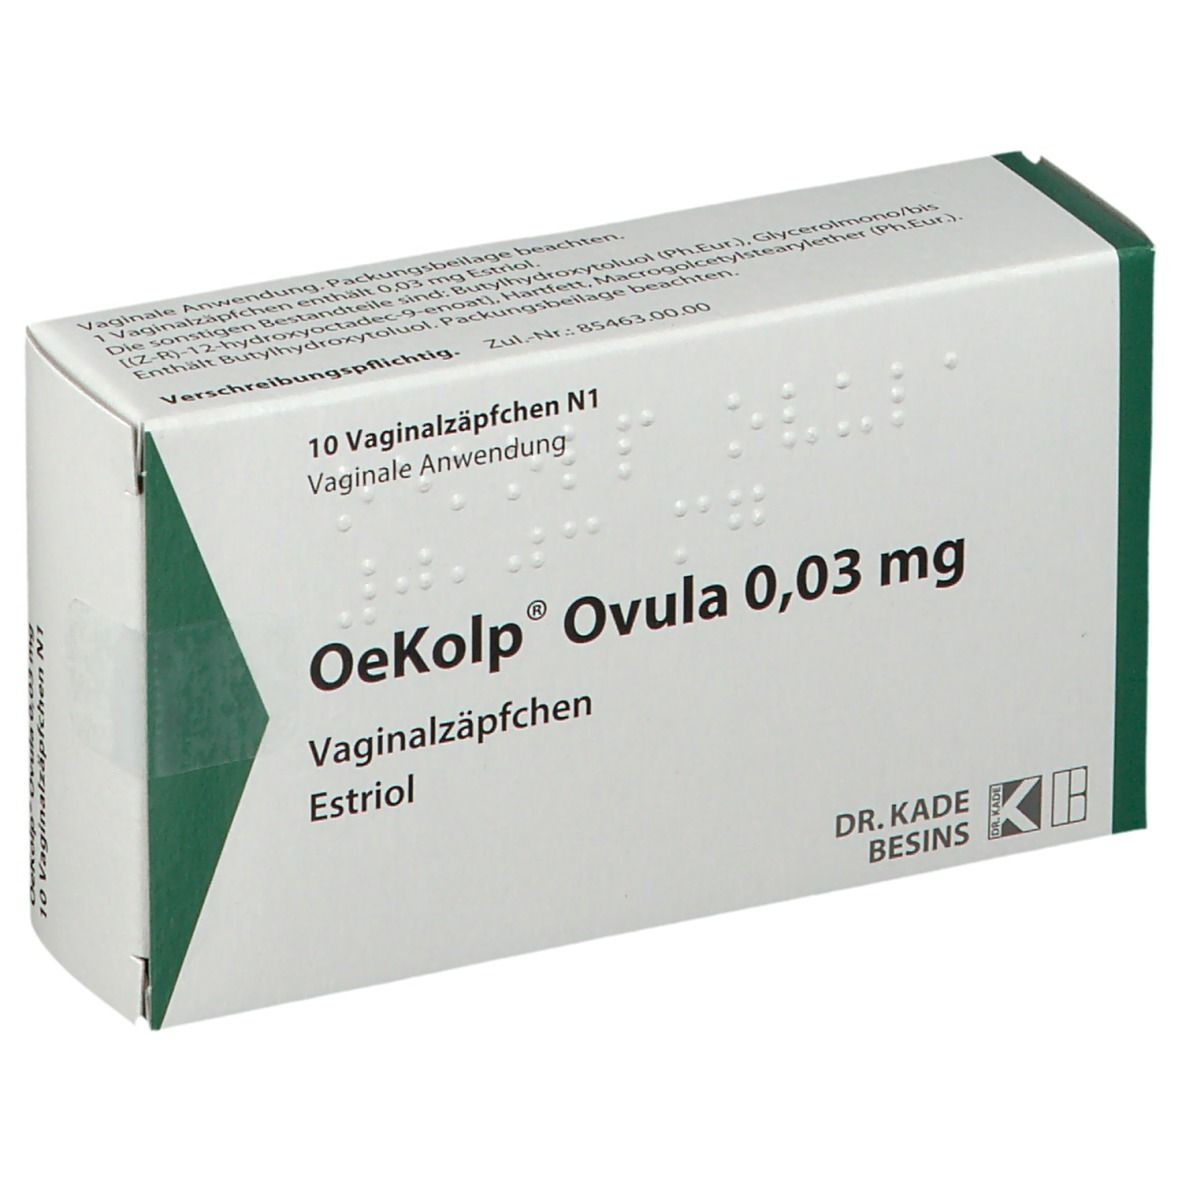 OEKOLP Ovula 0,03 mg Vaginalsuppositorien 10 St - shop